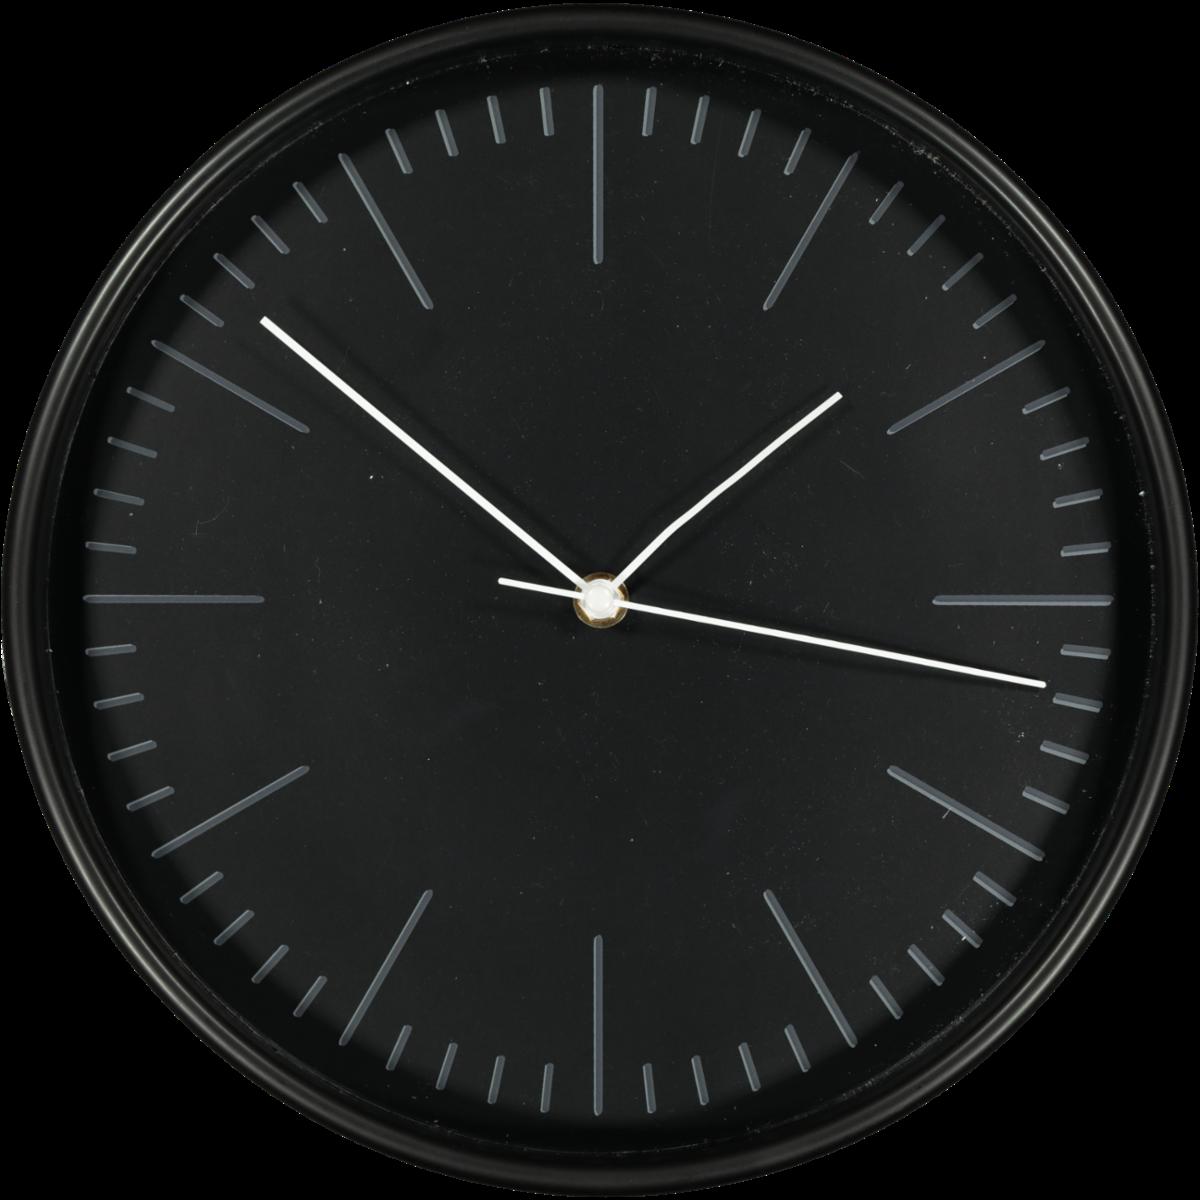 CLASSIC WALL CLOCK BLACK